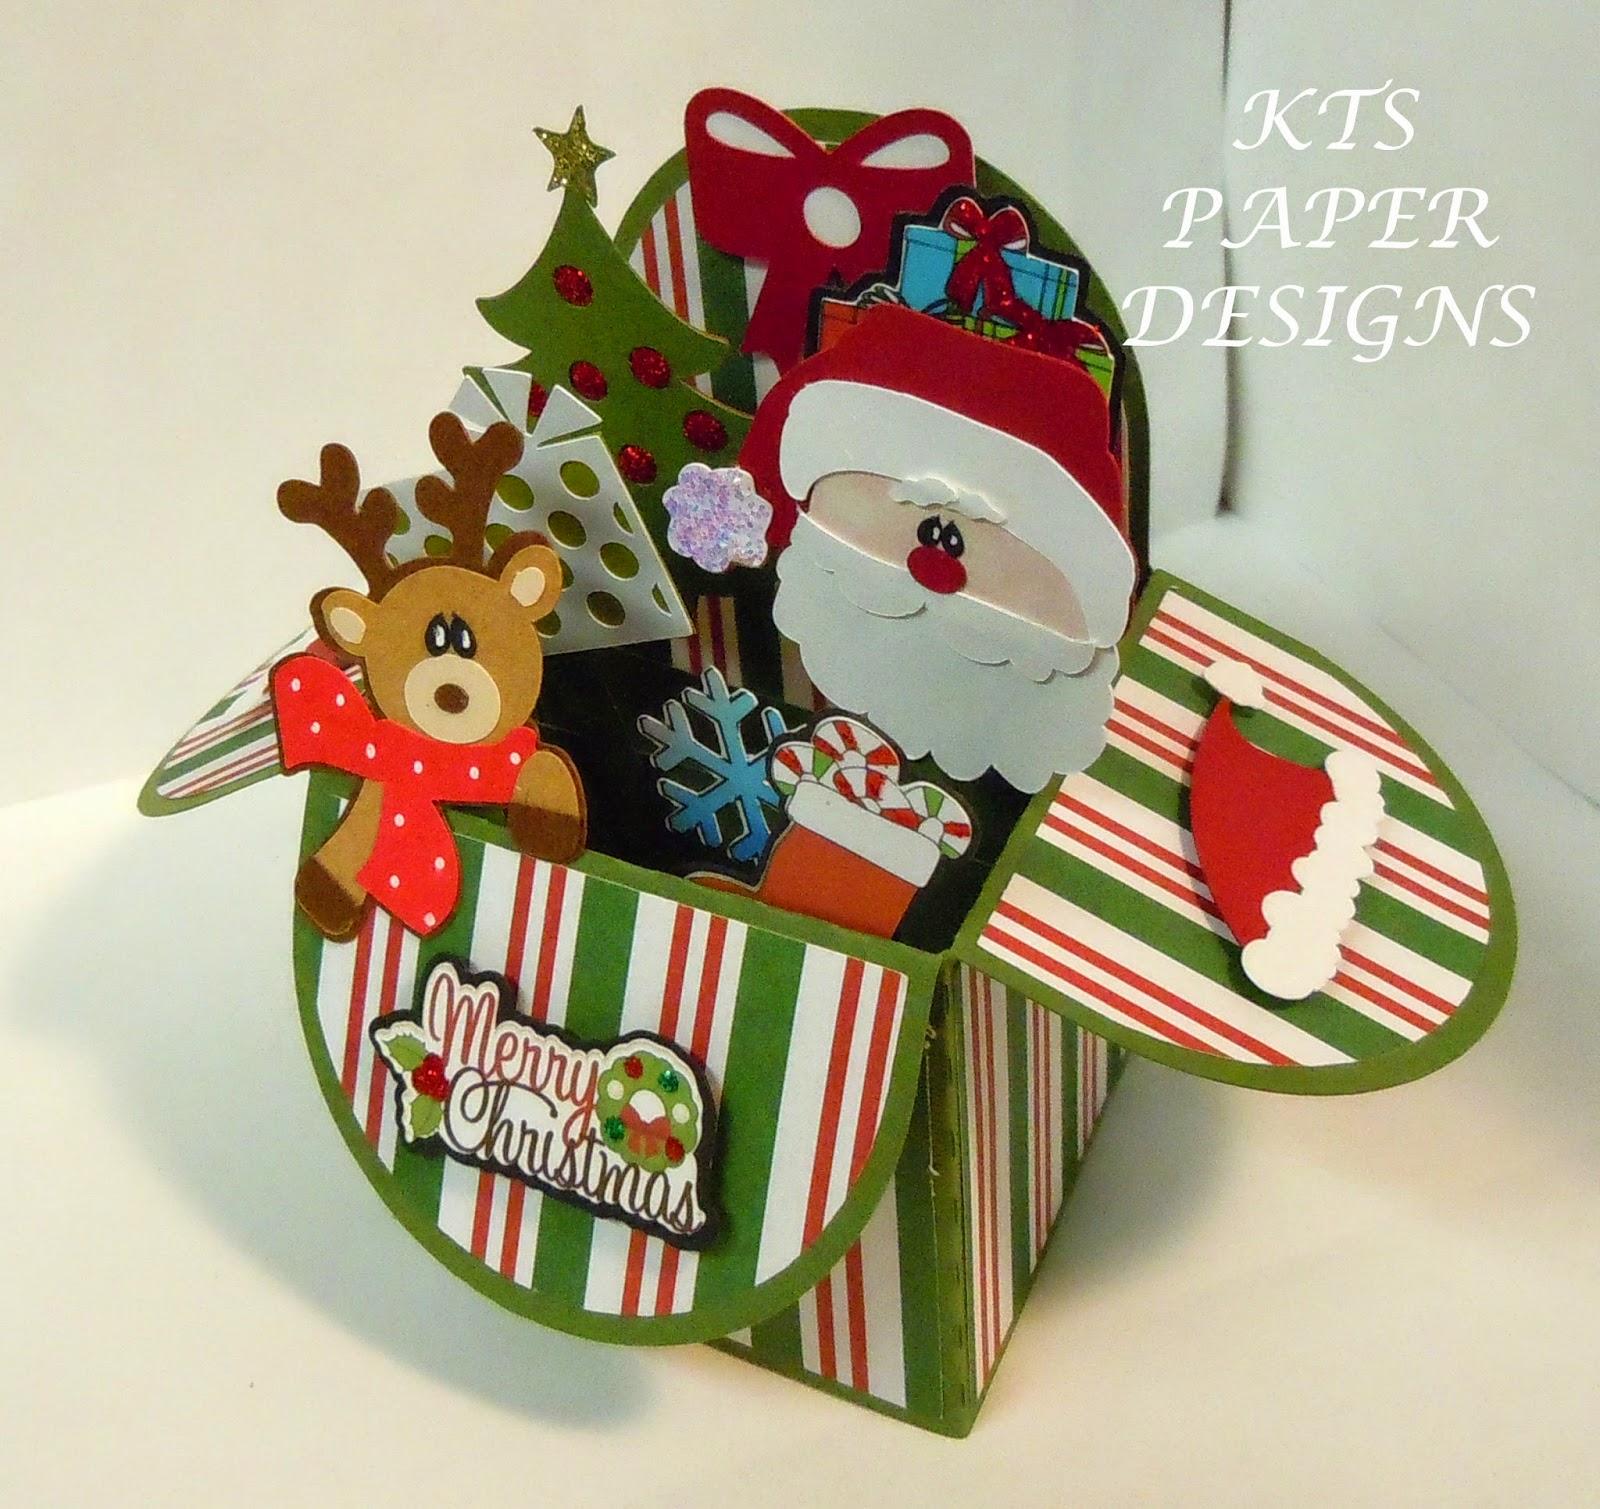 KTS Paper Designs: Card In A Box